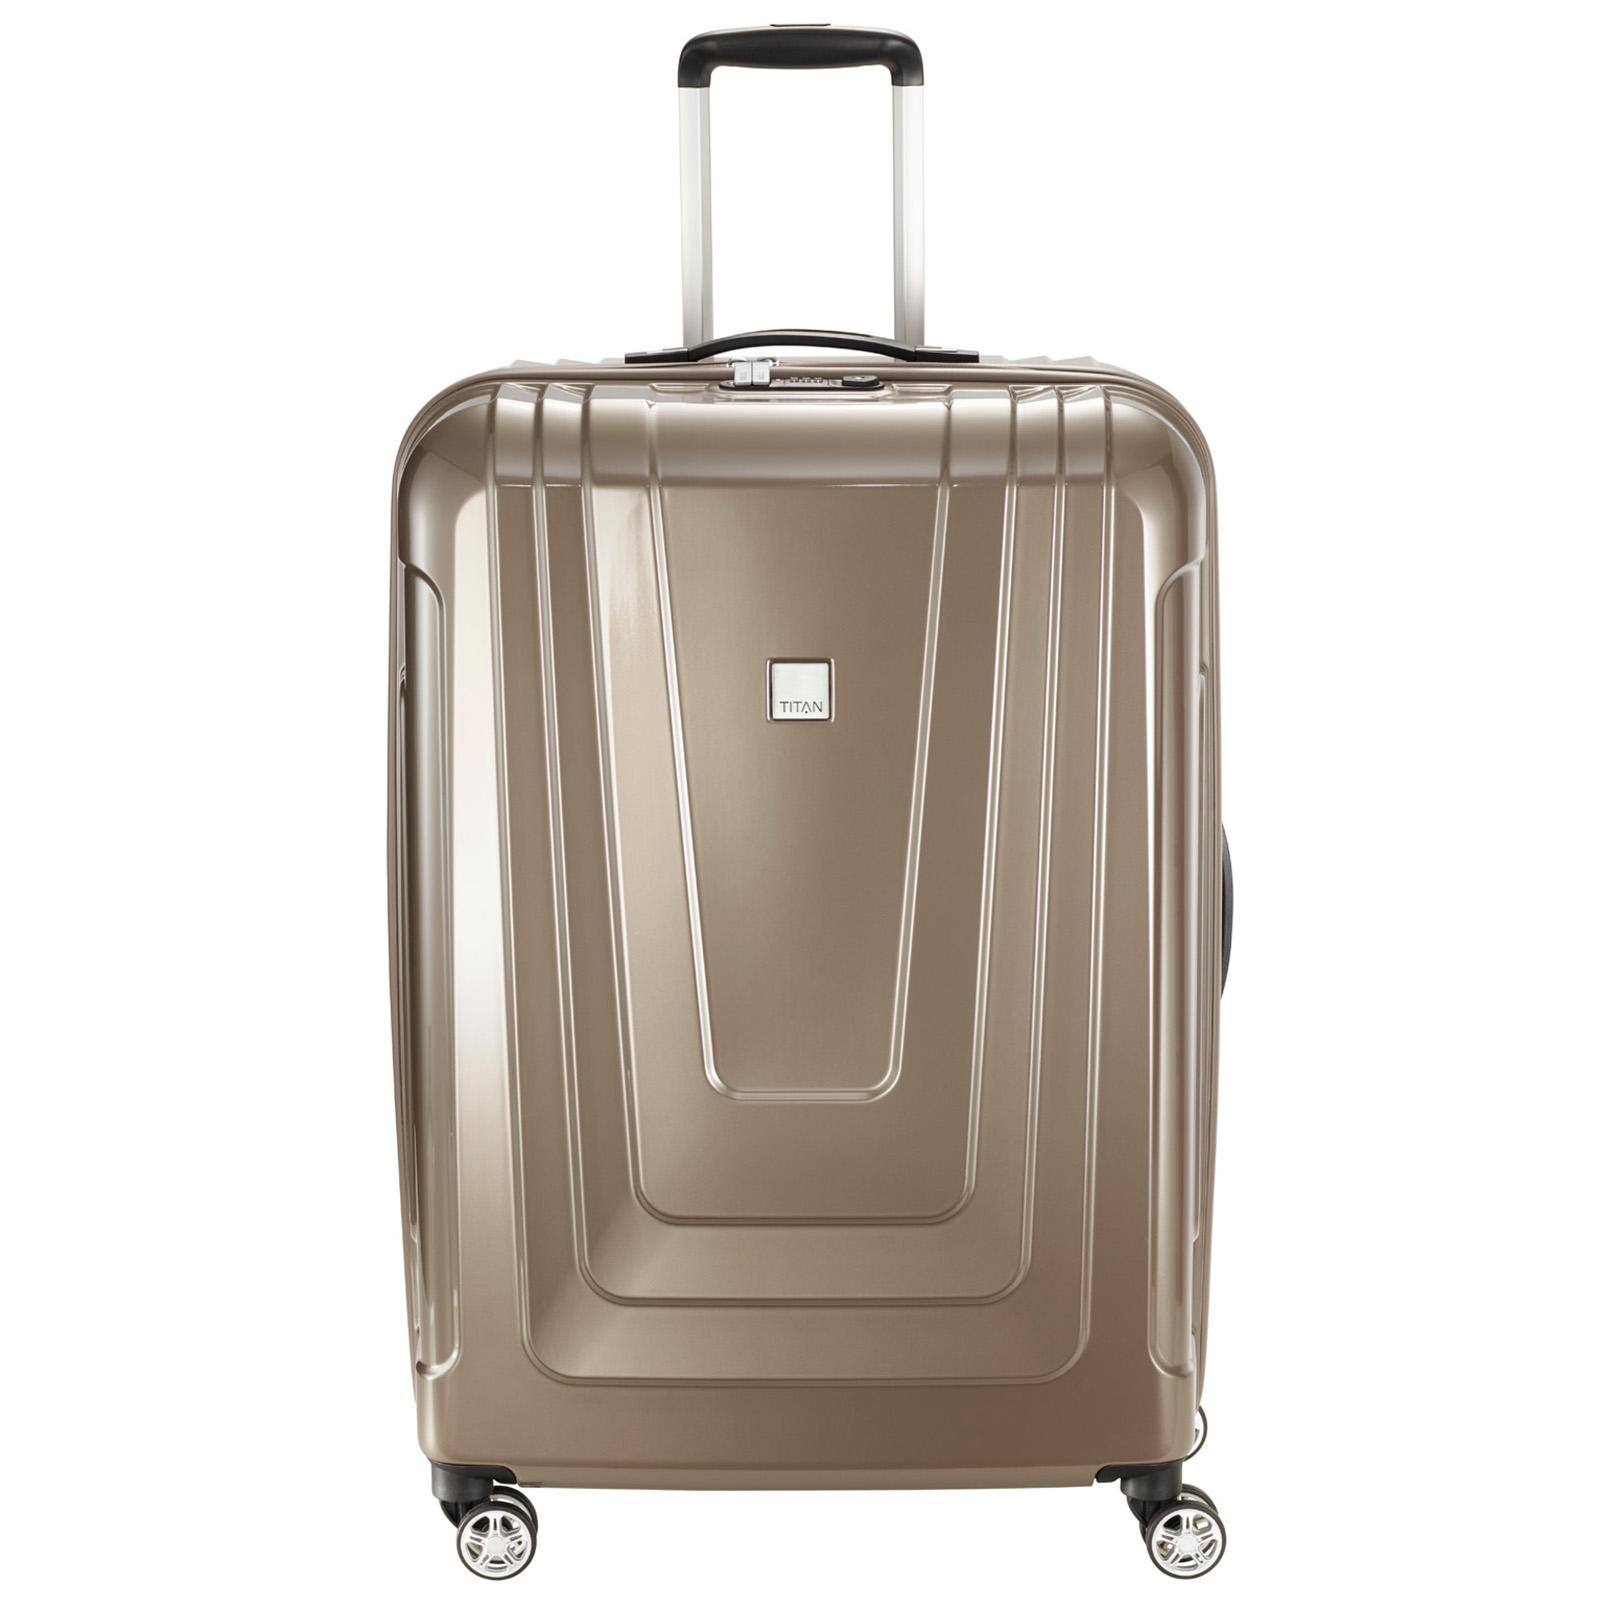 Pilotenkoffer & Trolleys Koffer, Taschen & Accessoires Titan X-ray 4 Rad Trolley L 77 Cm Auswahlmaterialien